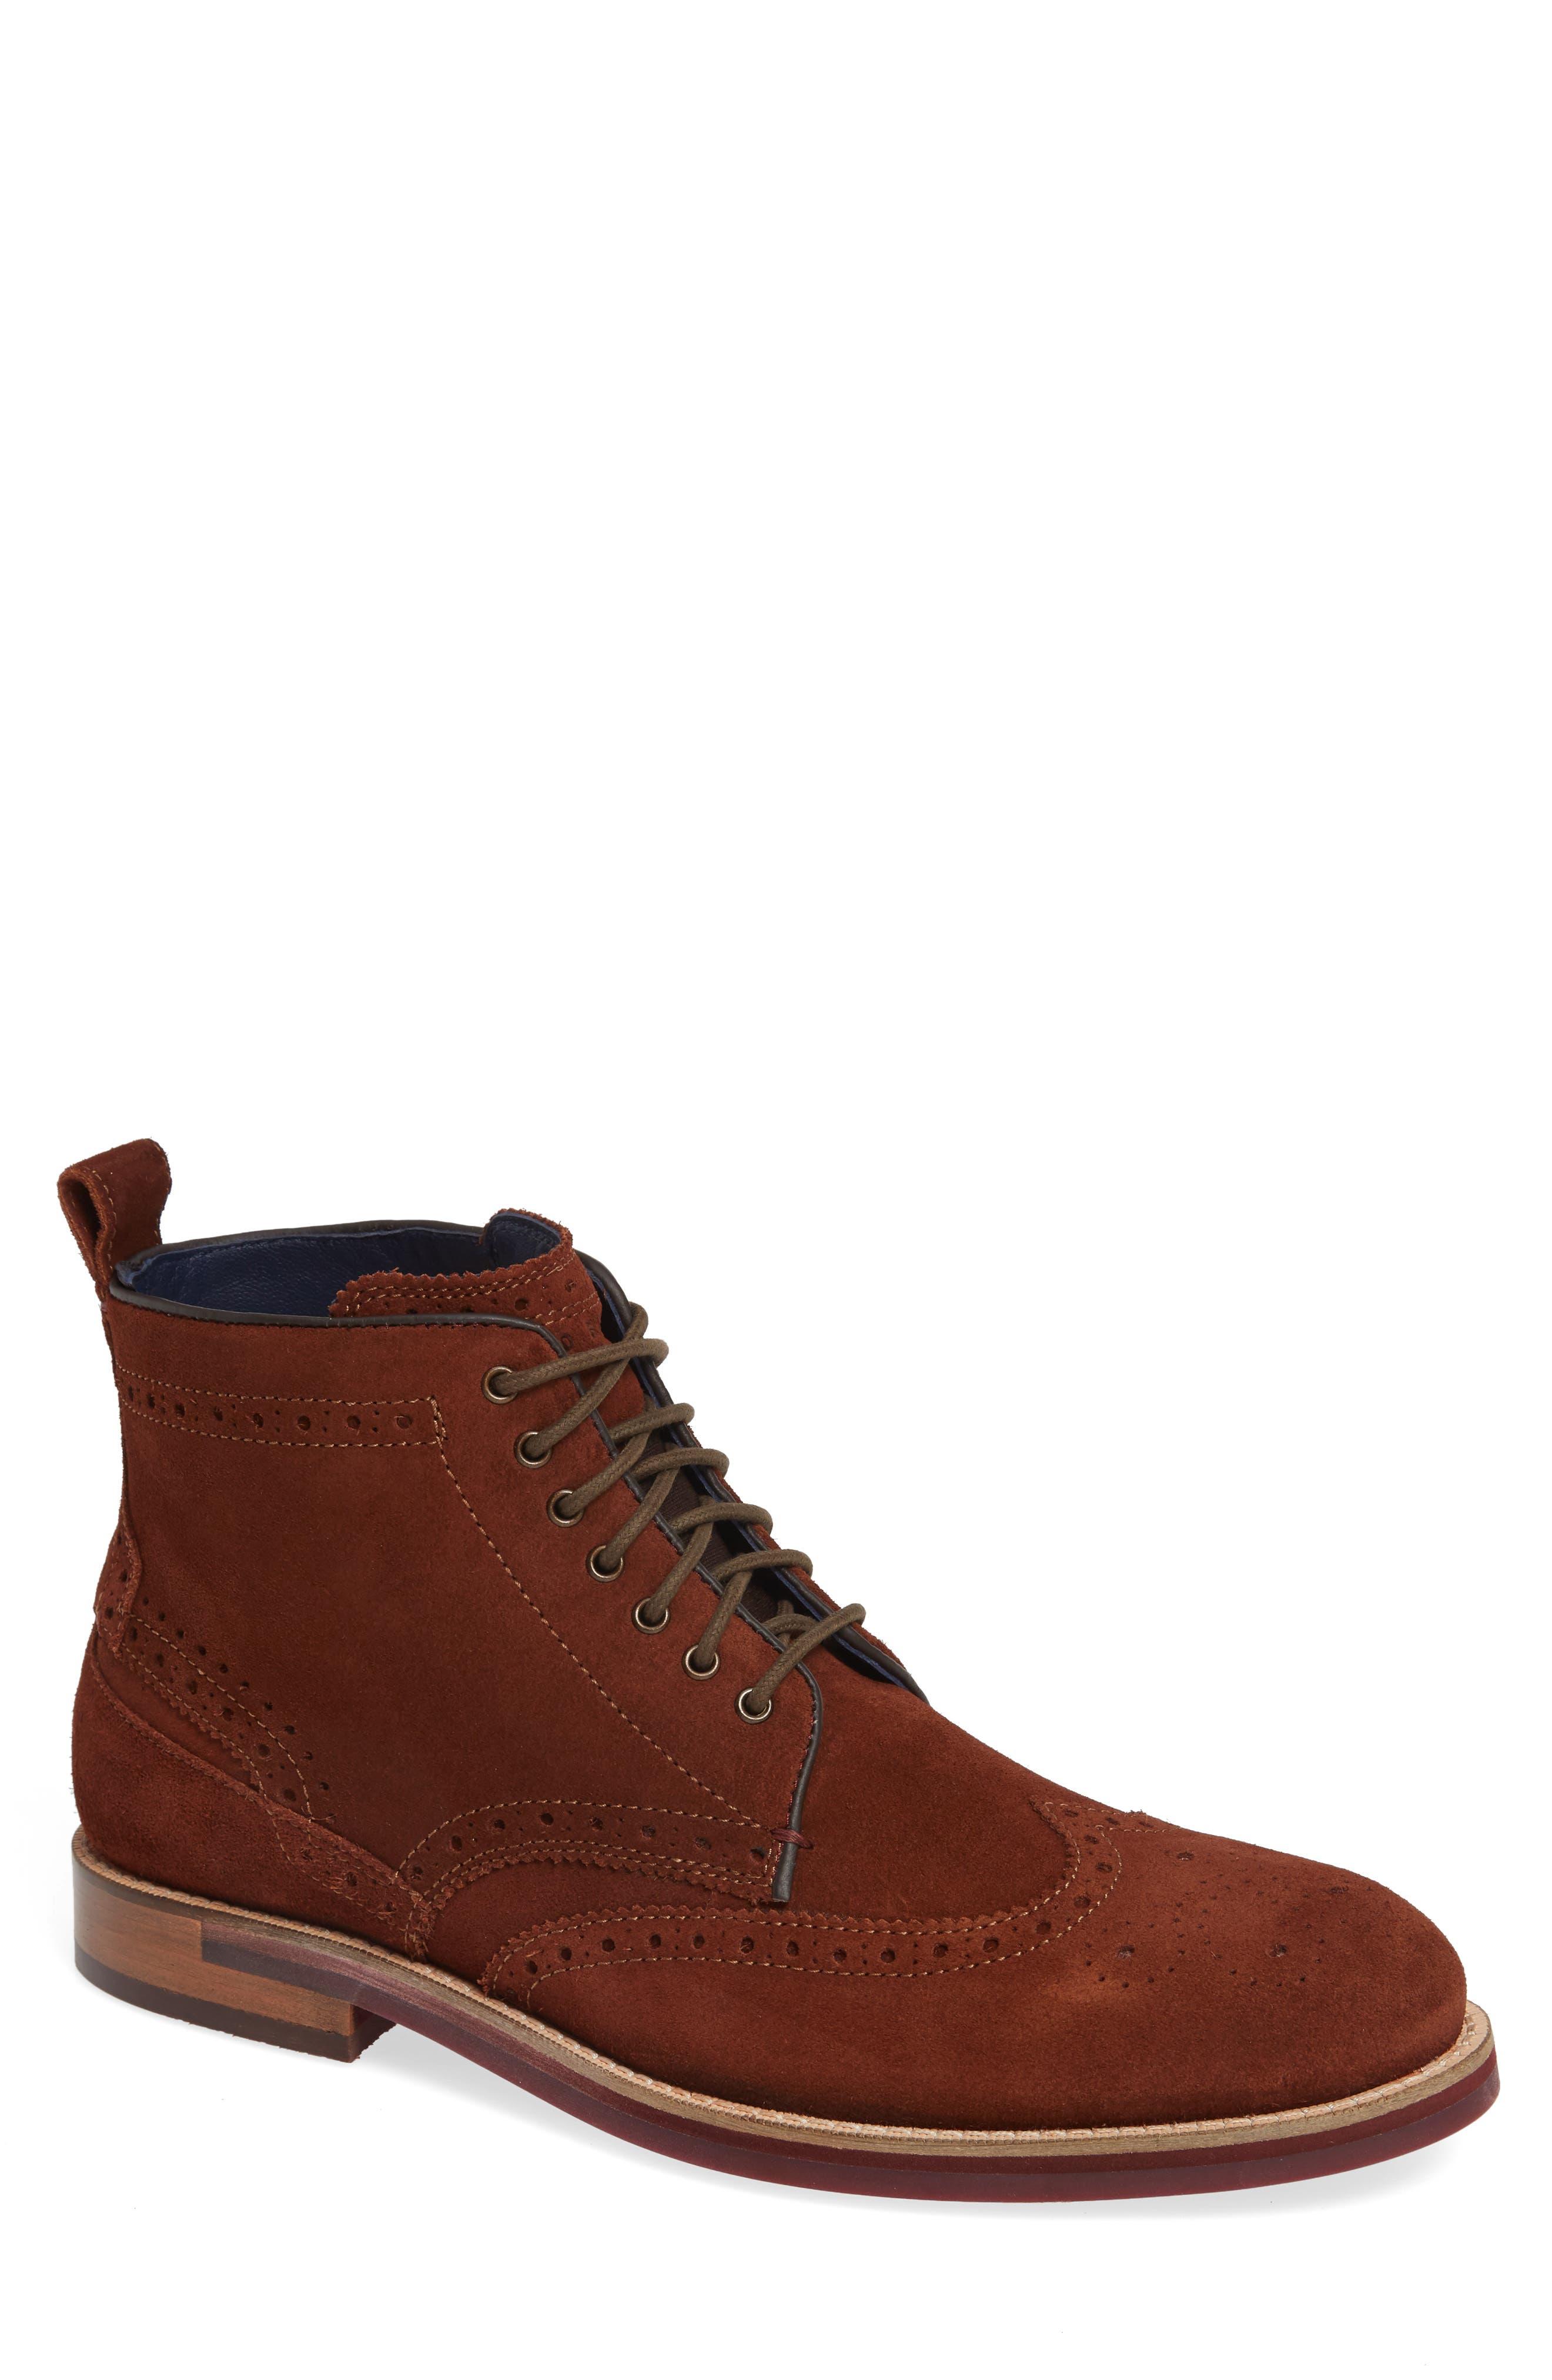 Ted Baker London Shennjo Boot, Brown